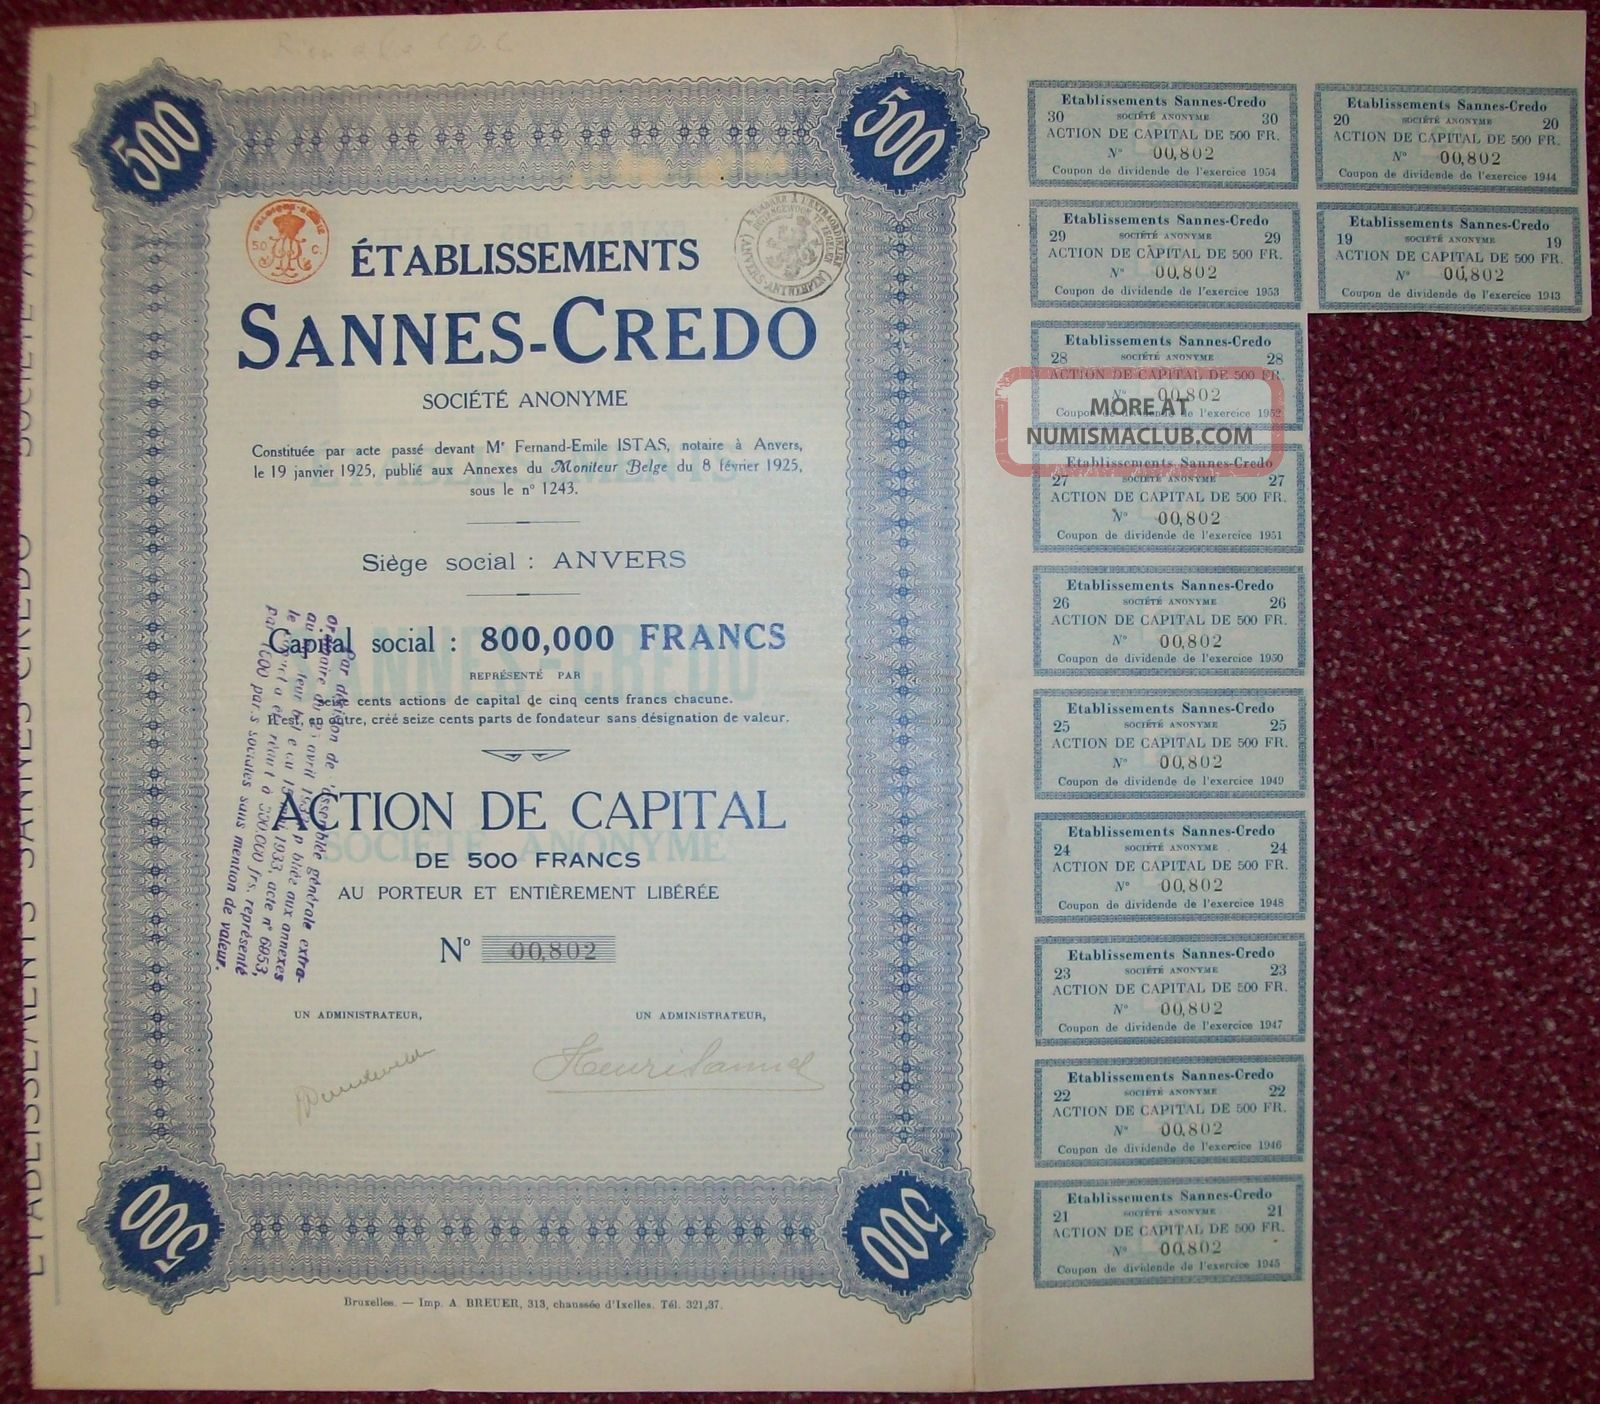 Belgium 1925 Bond - Sannes Credo Anvers - Tabac Tobacco. . .  R3378 World photo